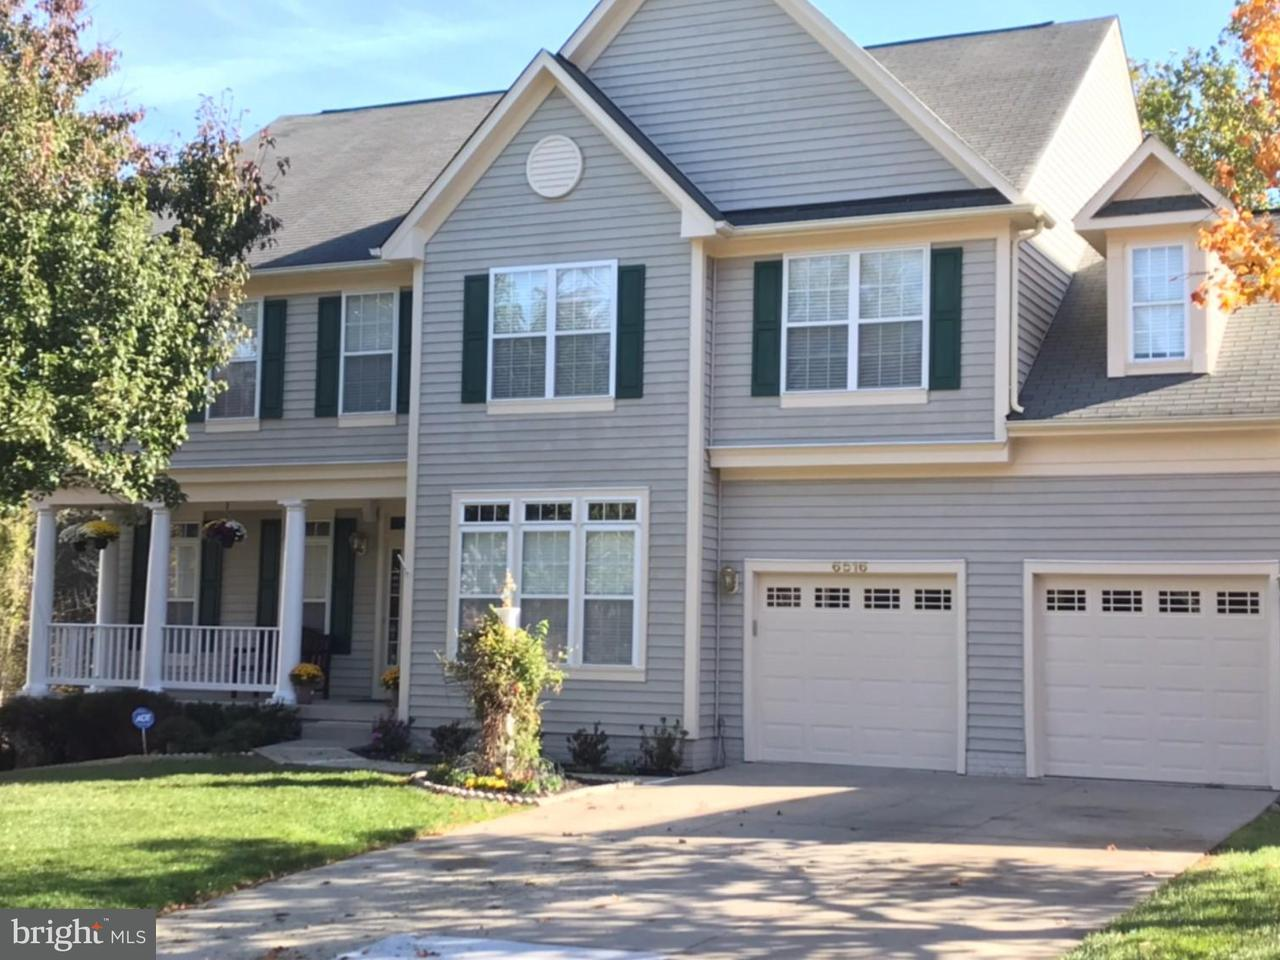 Maison unifamiliale pour l Vente à 6516 EARLY LILY ROW 6516 EARLY LILY ROW Columbia, Maryland 21044 États-Unis